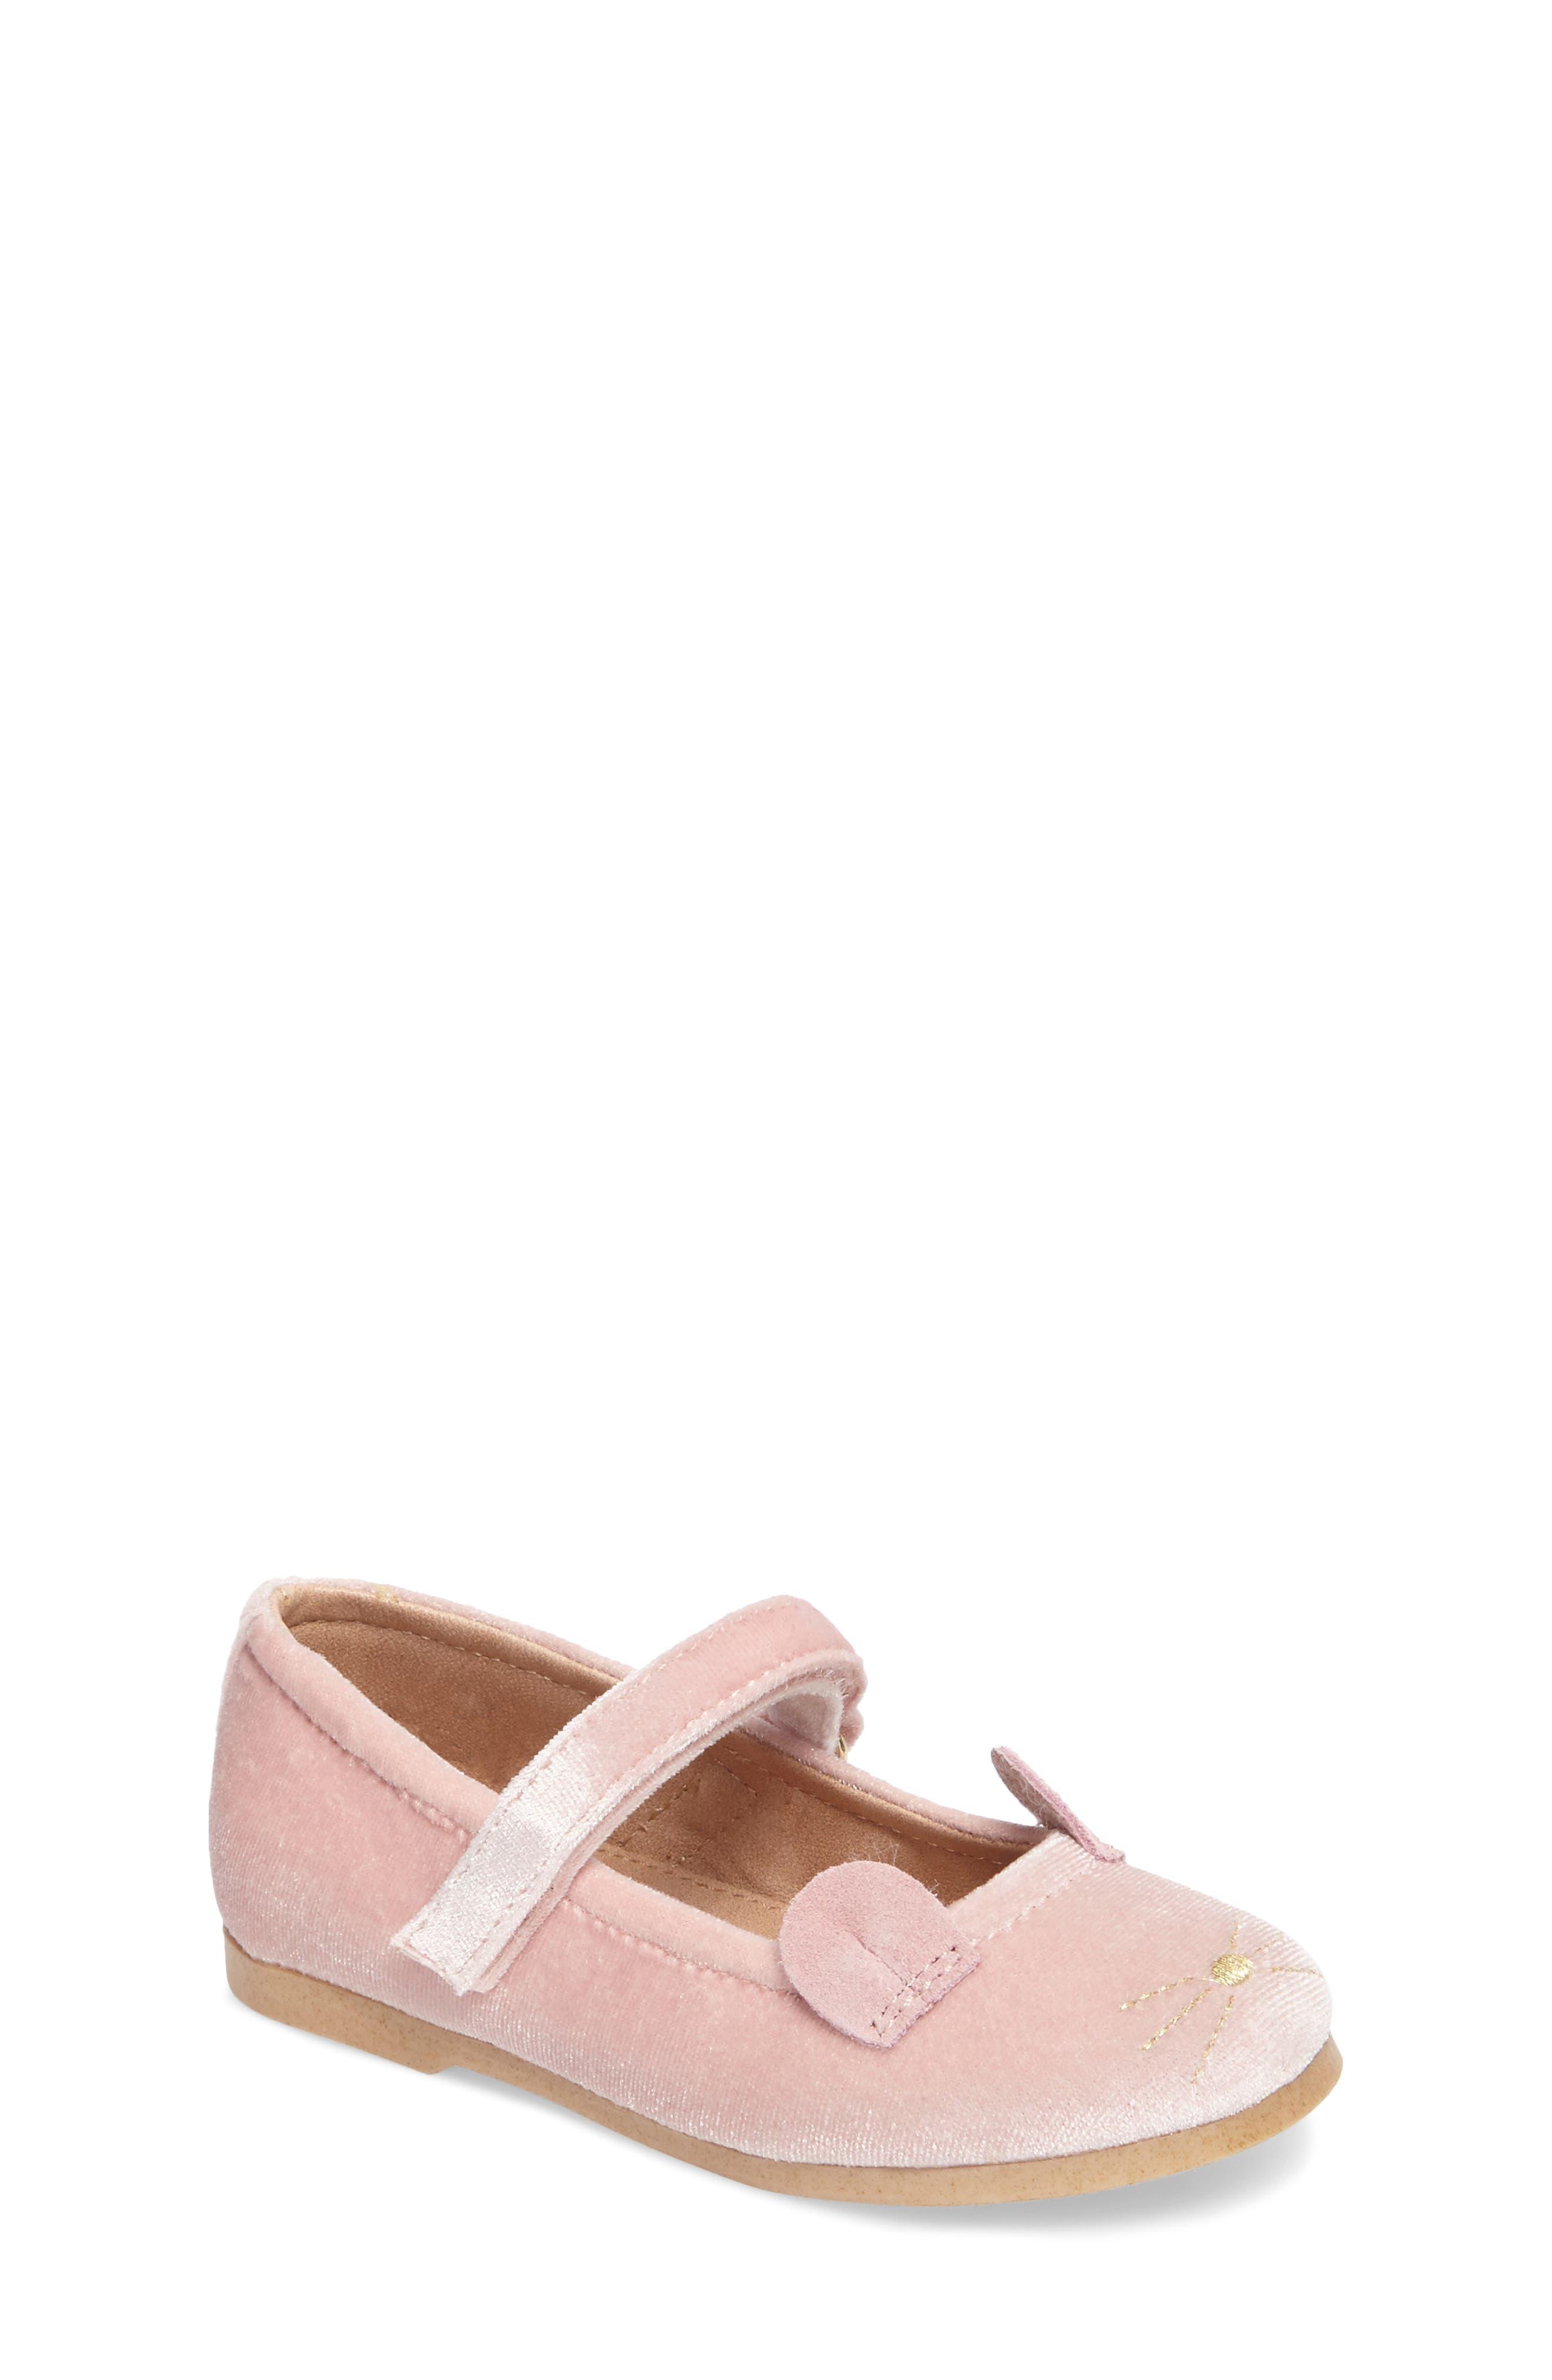 Mouse Mary Jane Flat,                         Main,                         color, Blush Velvet Fabric